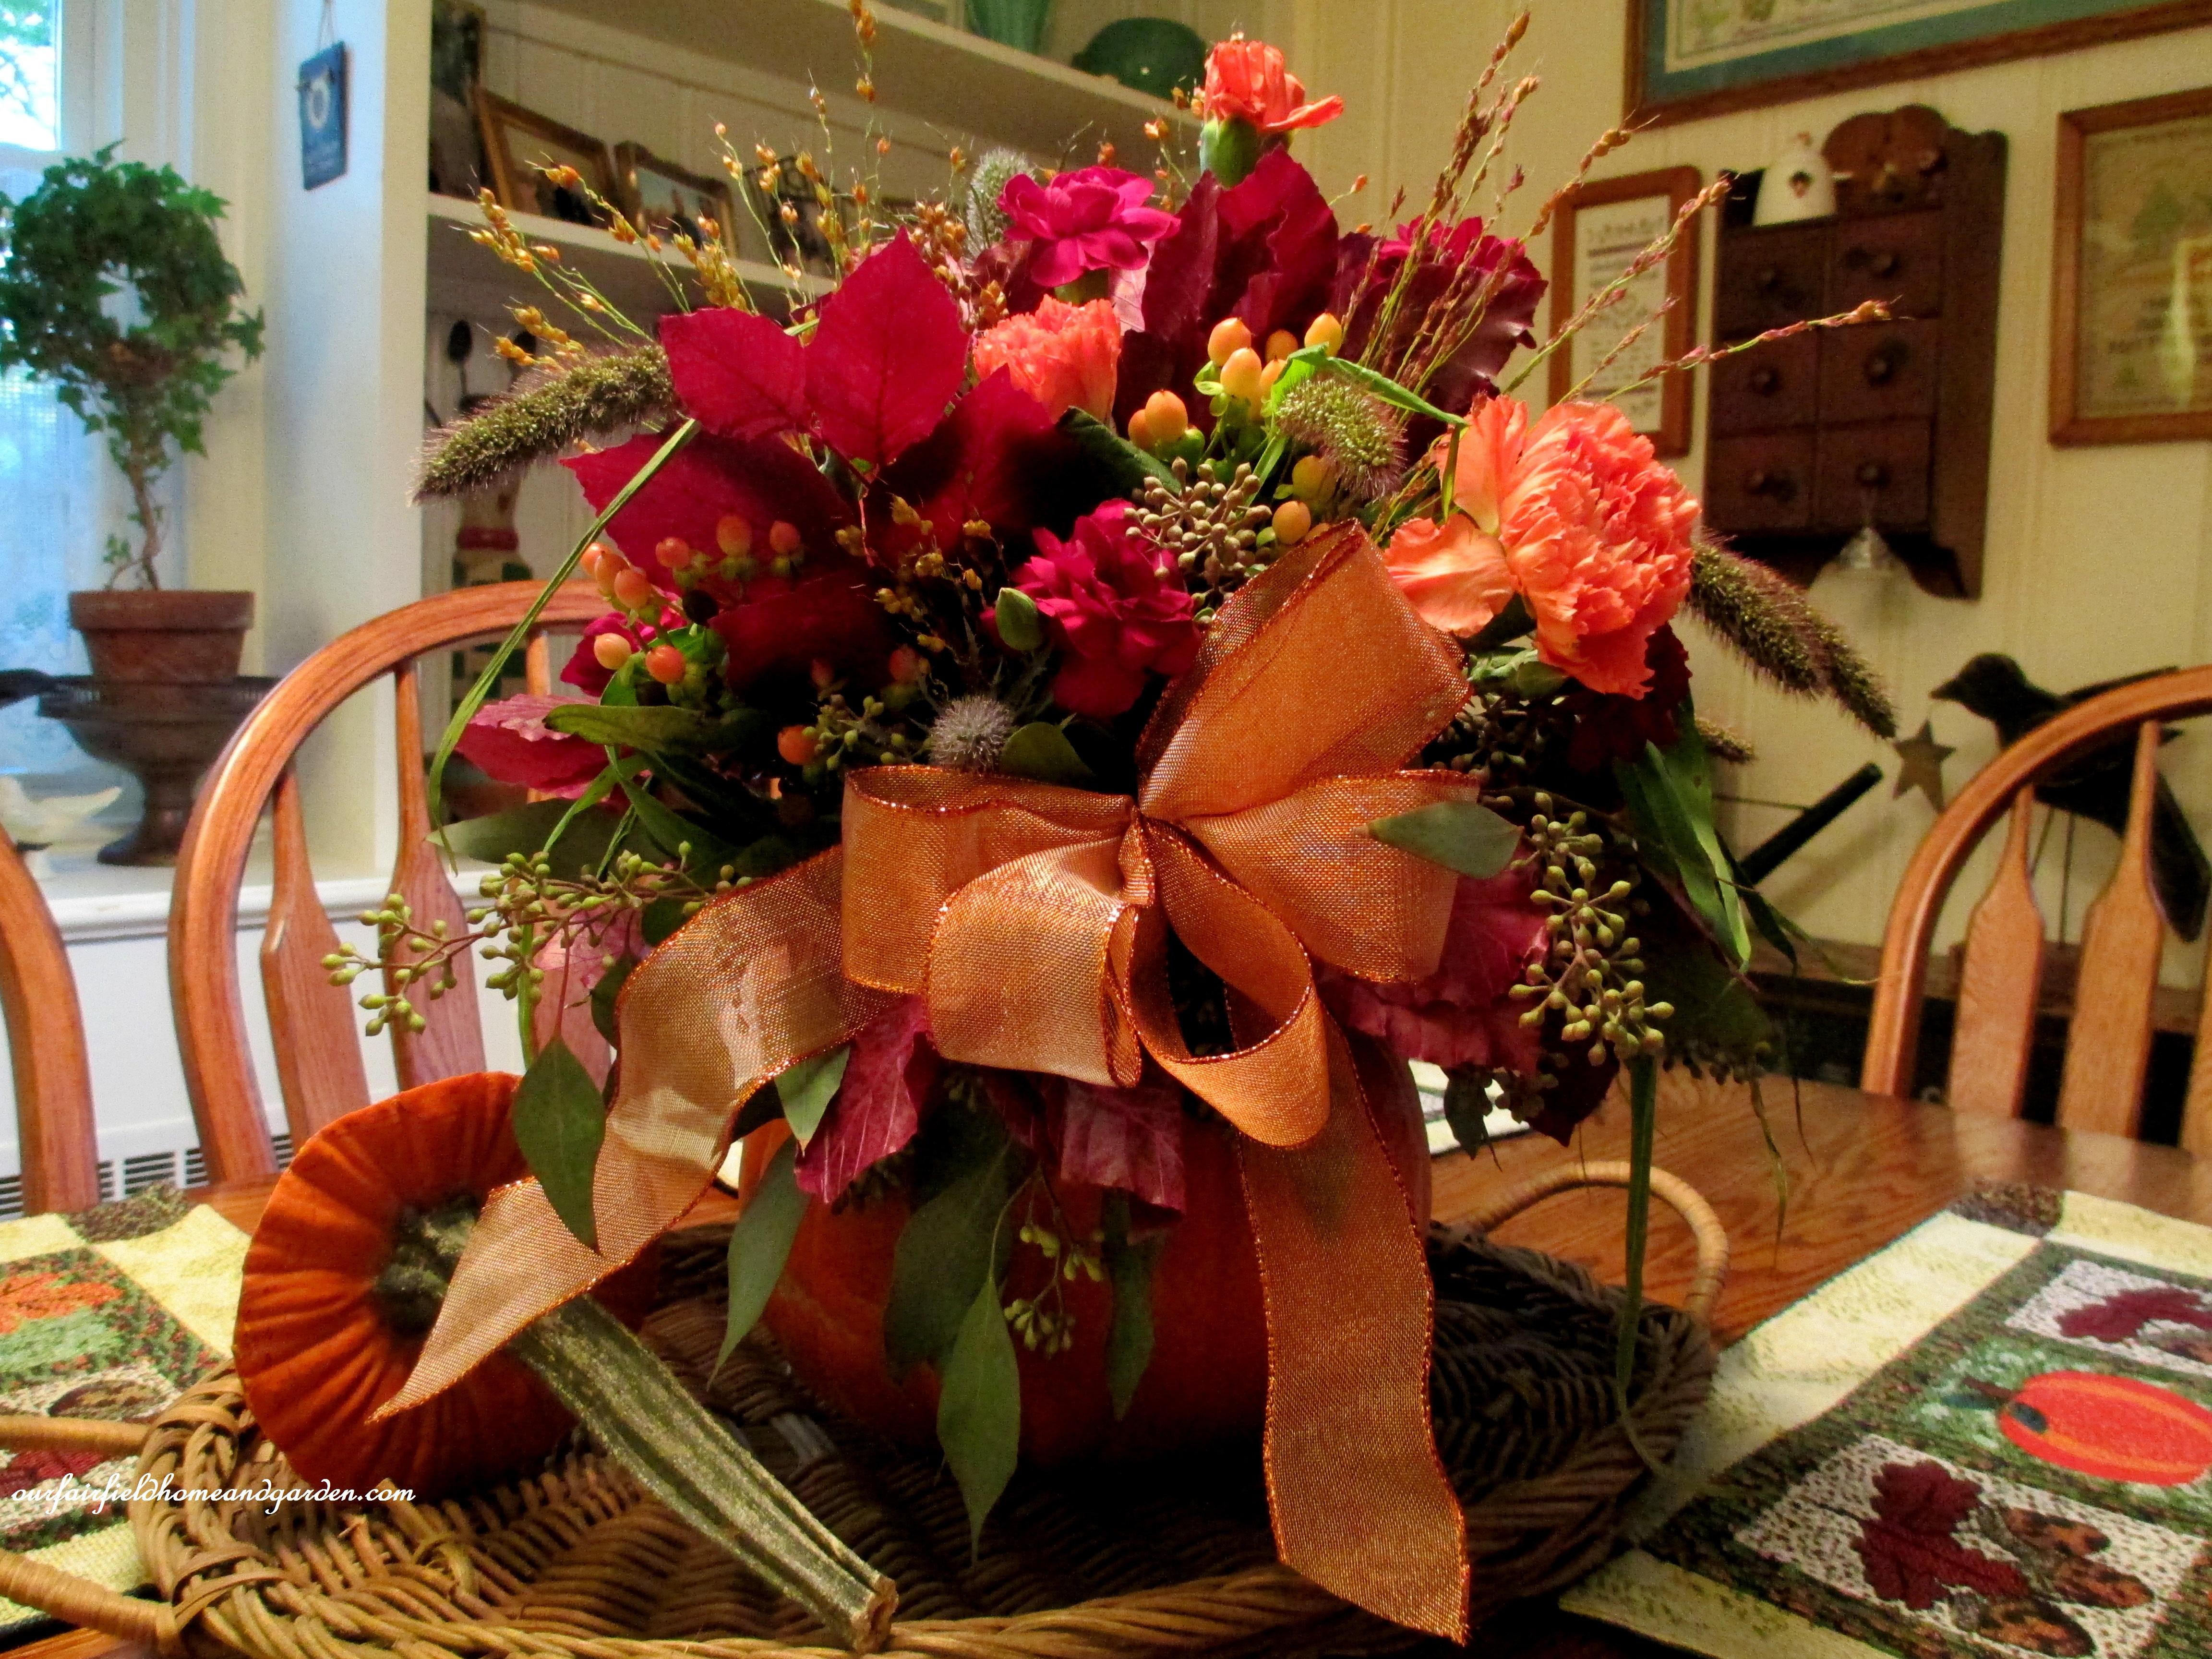 Field Trip: Creating a Beautiful Fall Floral Arrangement in a ...